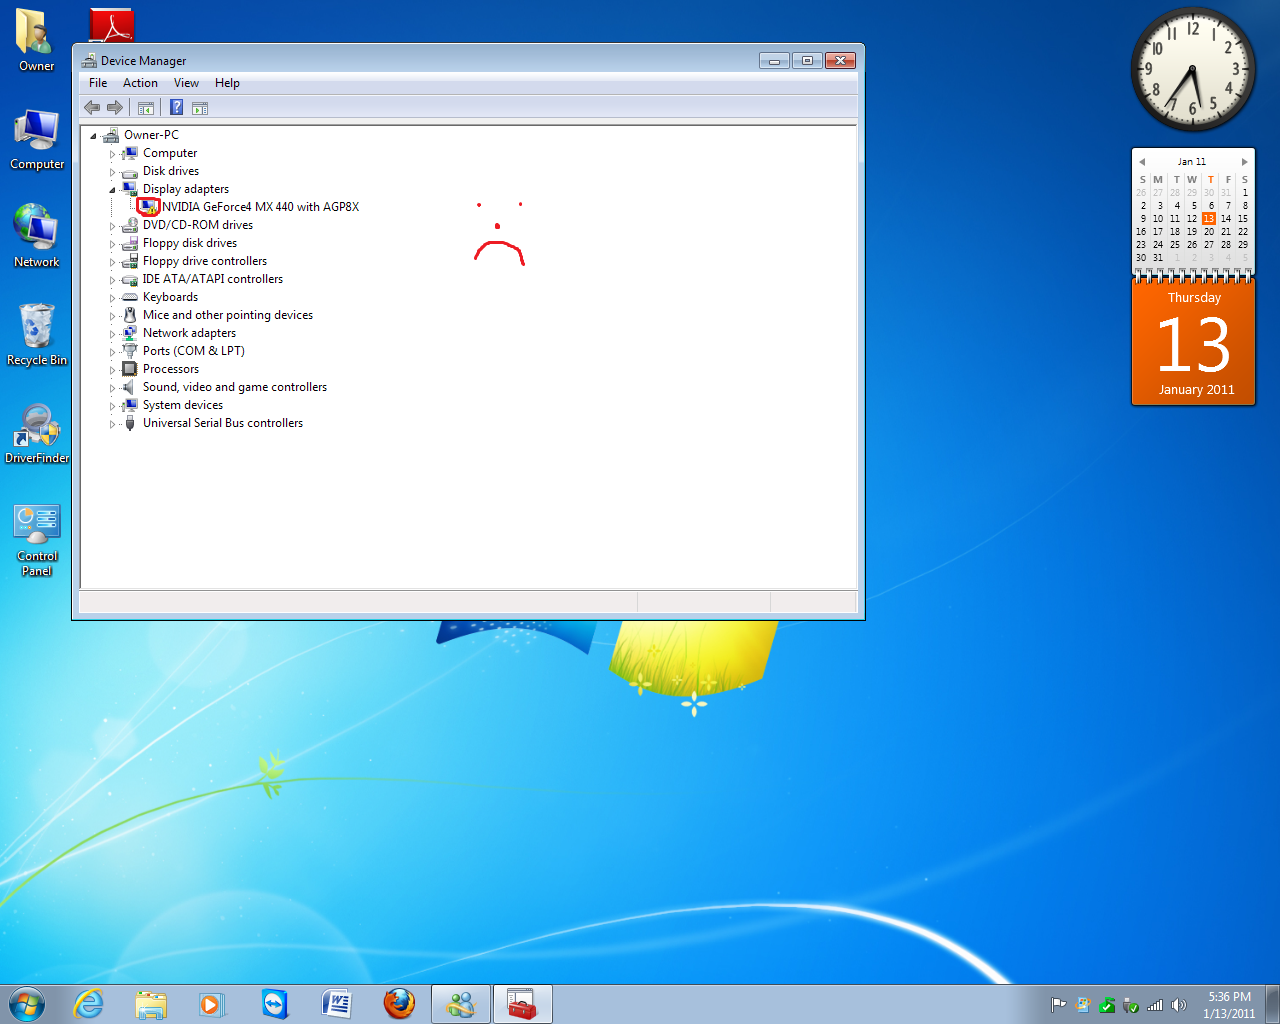 download driver vga windows 7 64 bit terbaru